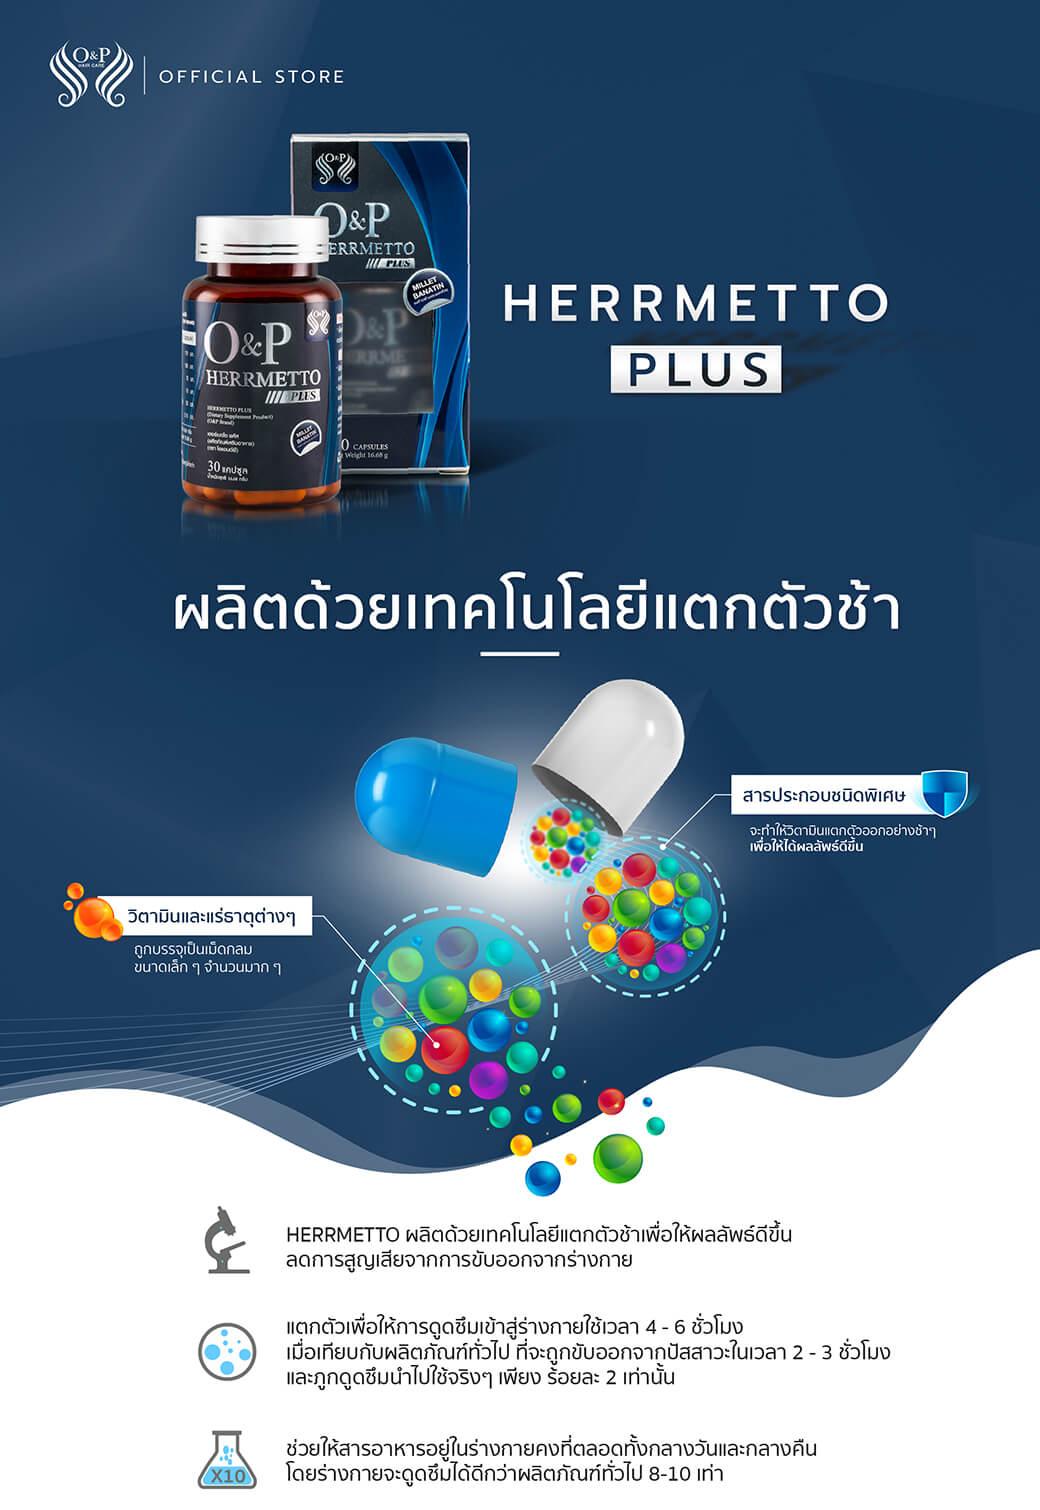 Rollikeet HERR PLUS 04 Herrmetto ผลิตภัณฑ์ดูแลรักษาเส้นผมชั้นนำ